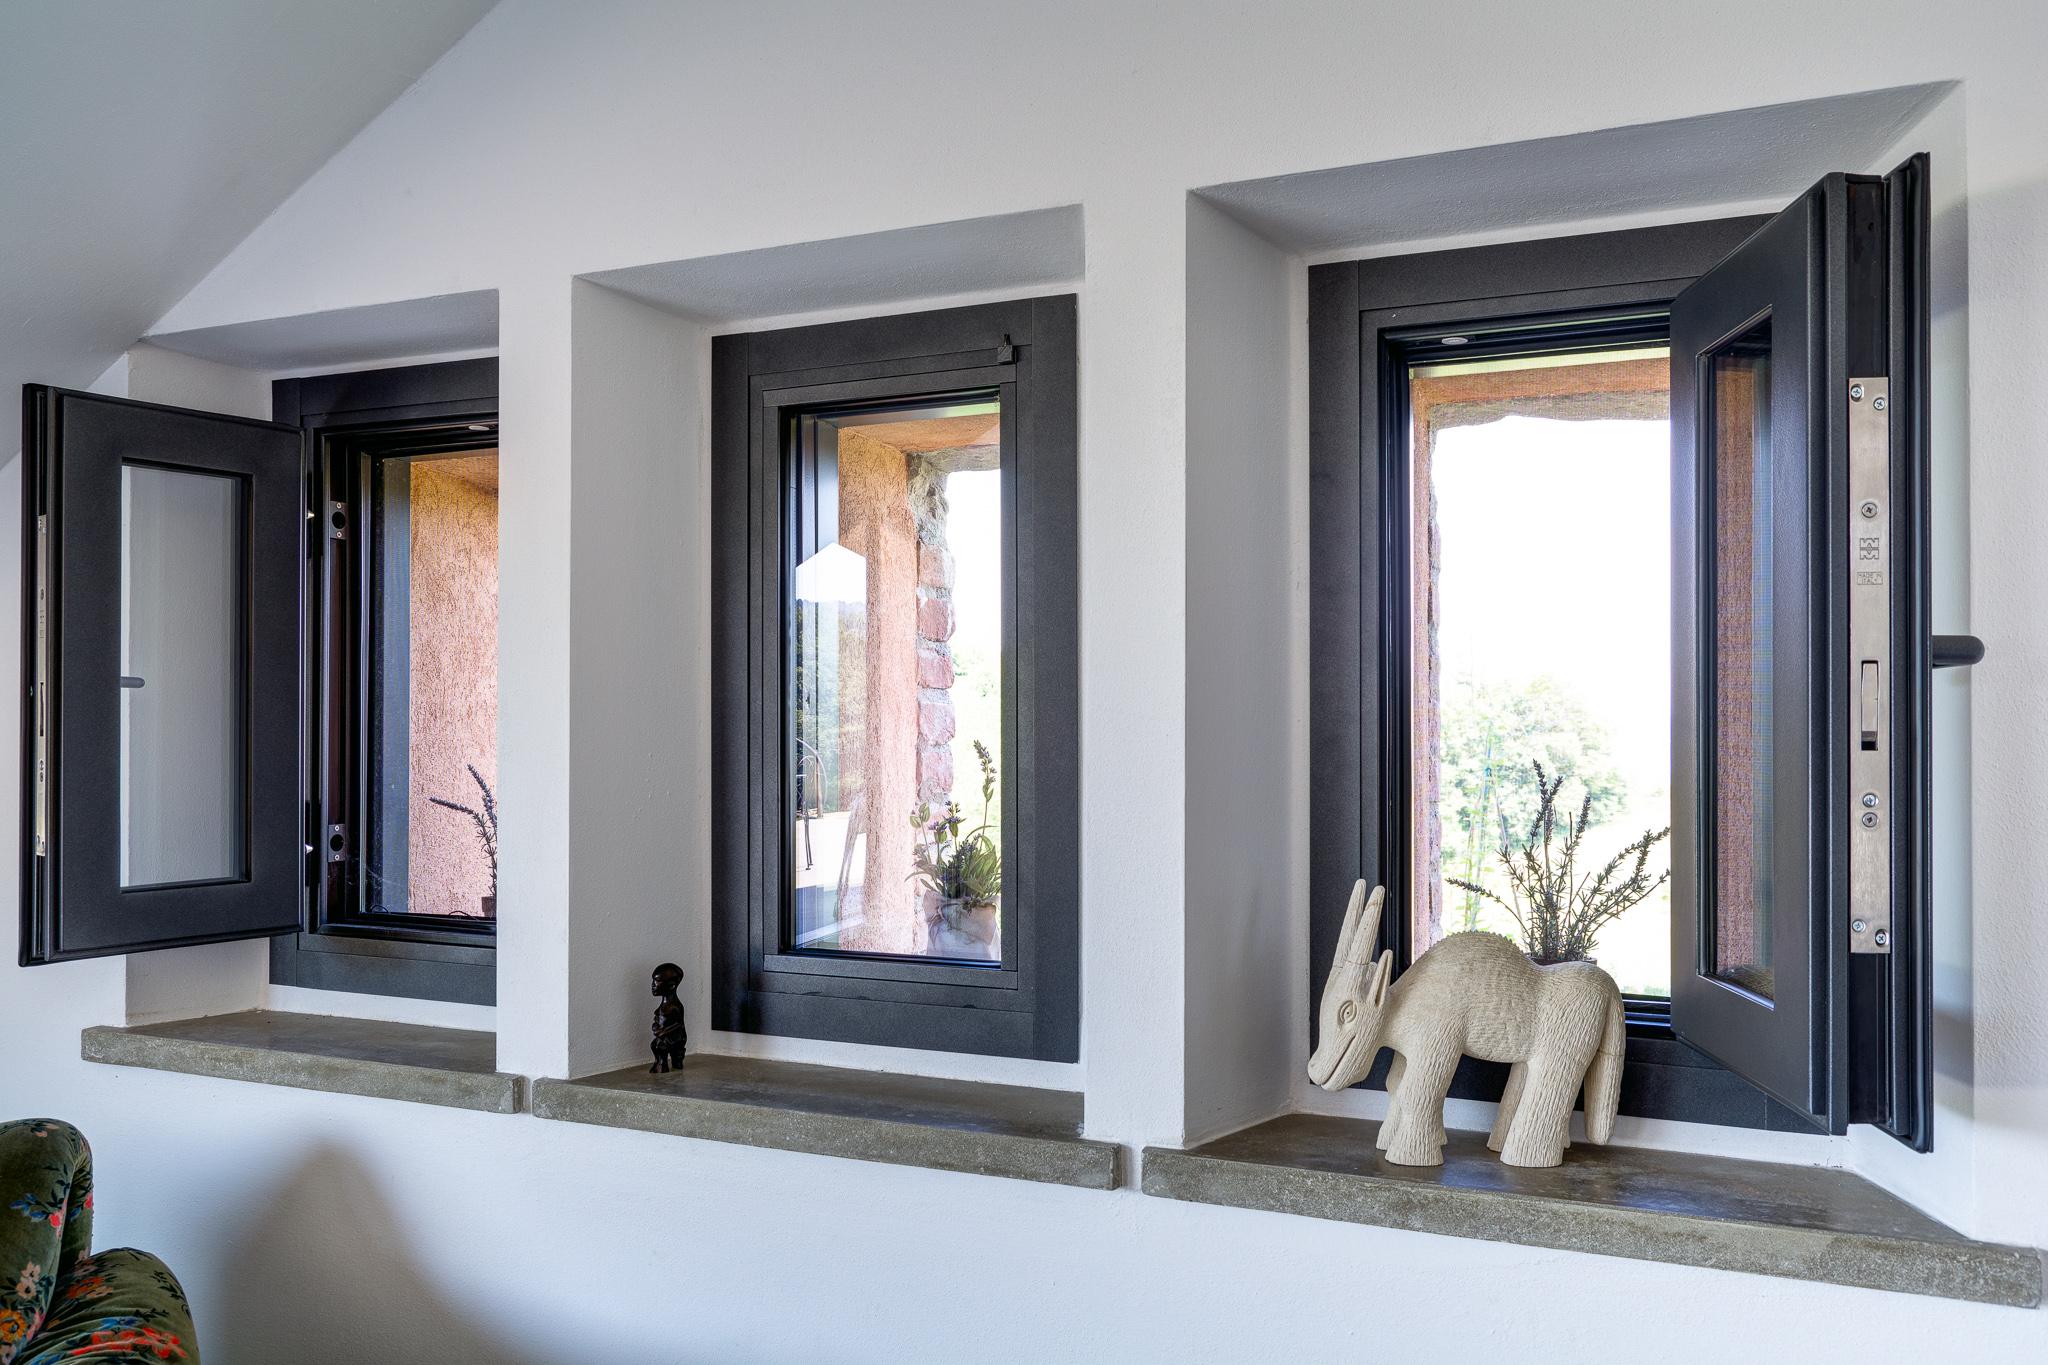 Le nostre finestre blindate calastrucci falegnameria for Finestre velux blindate